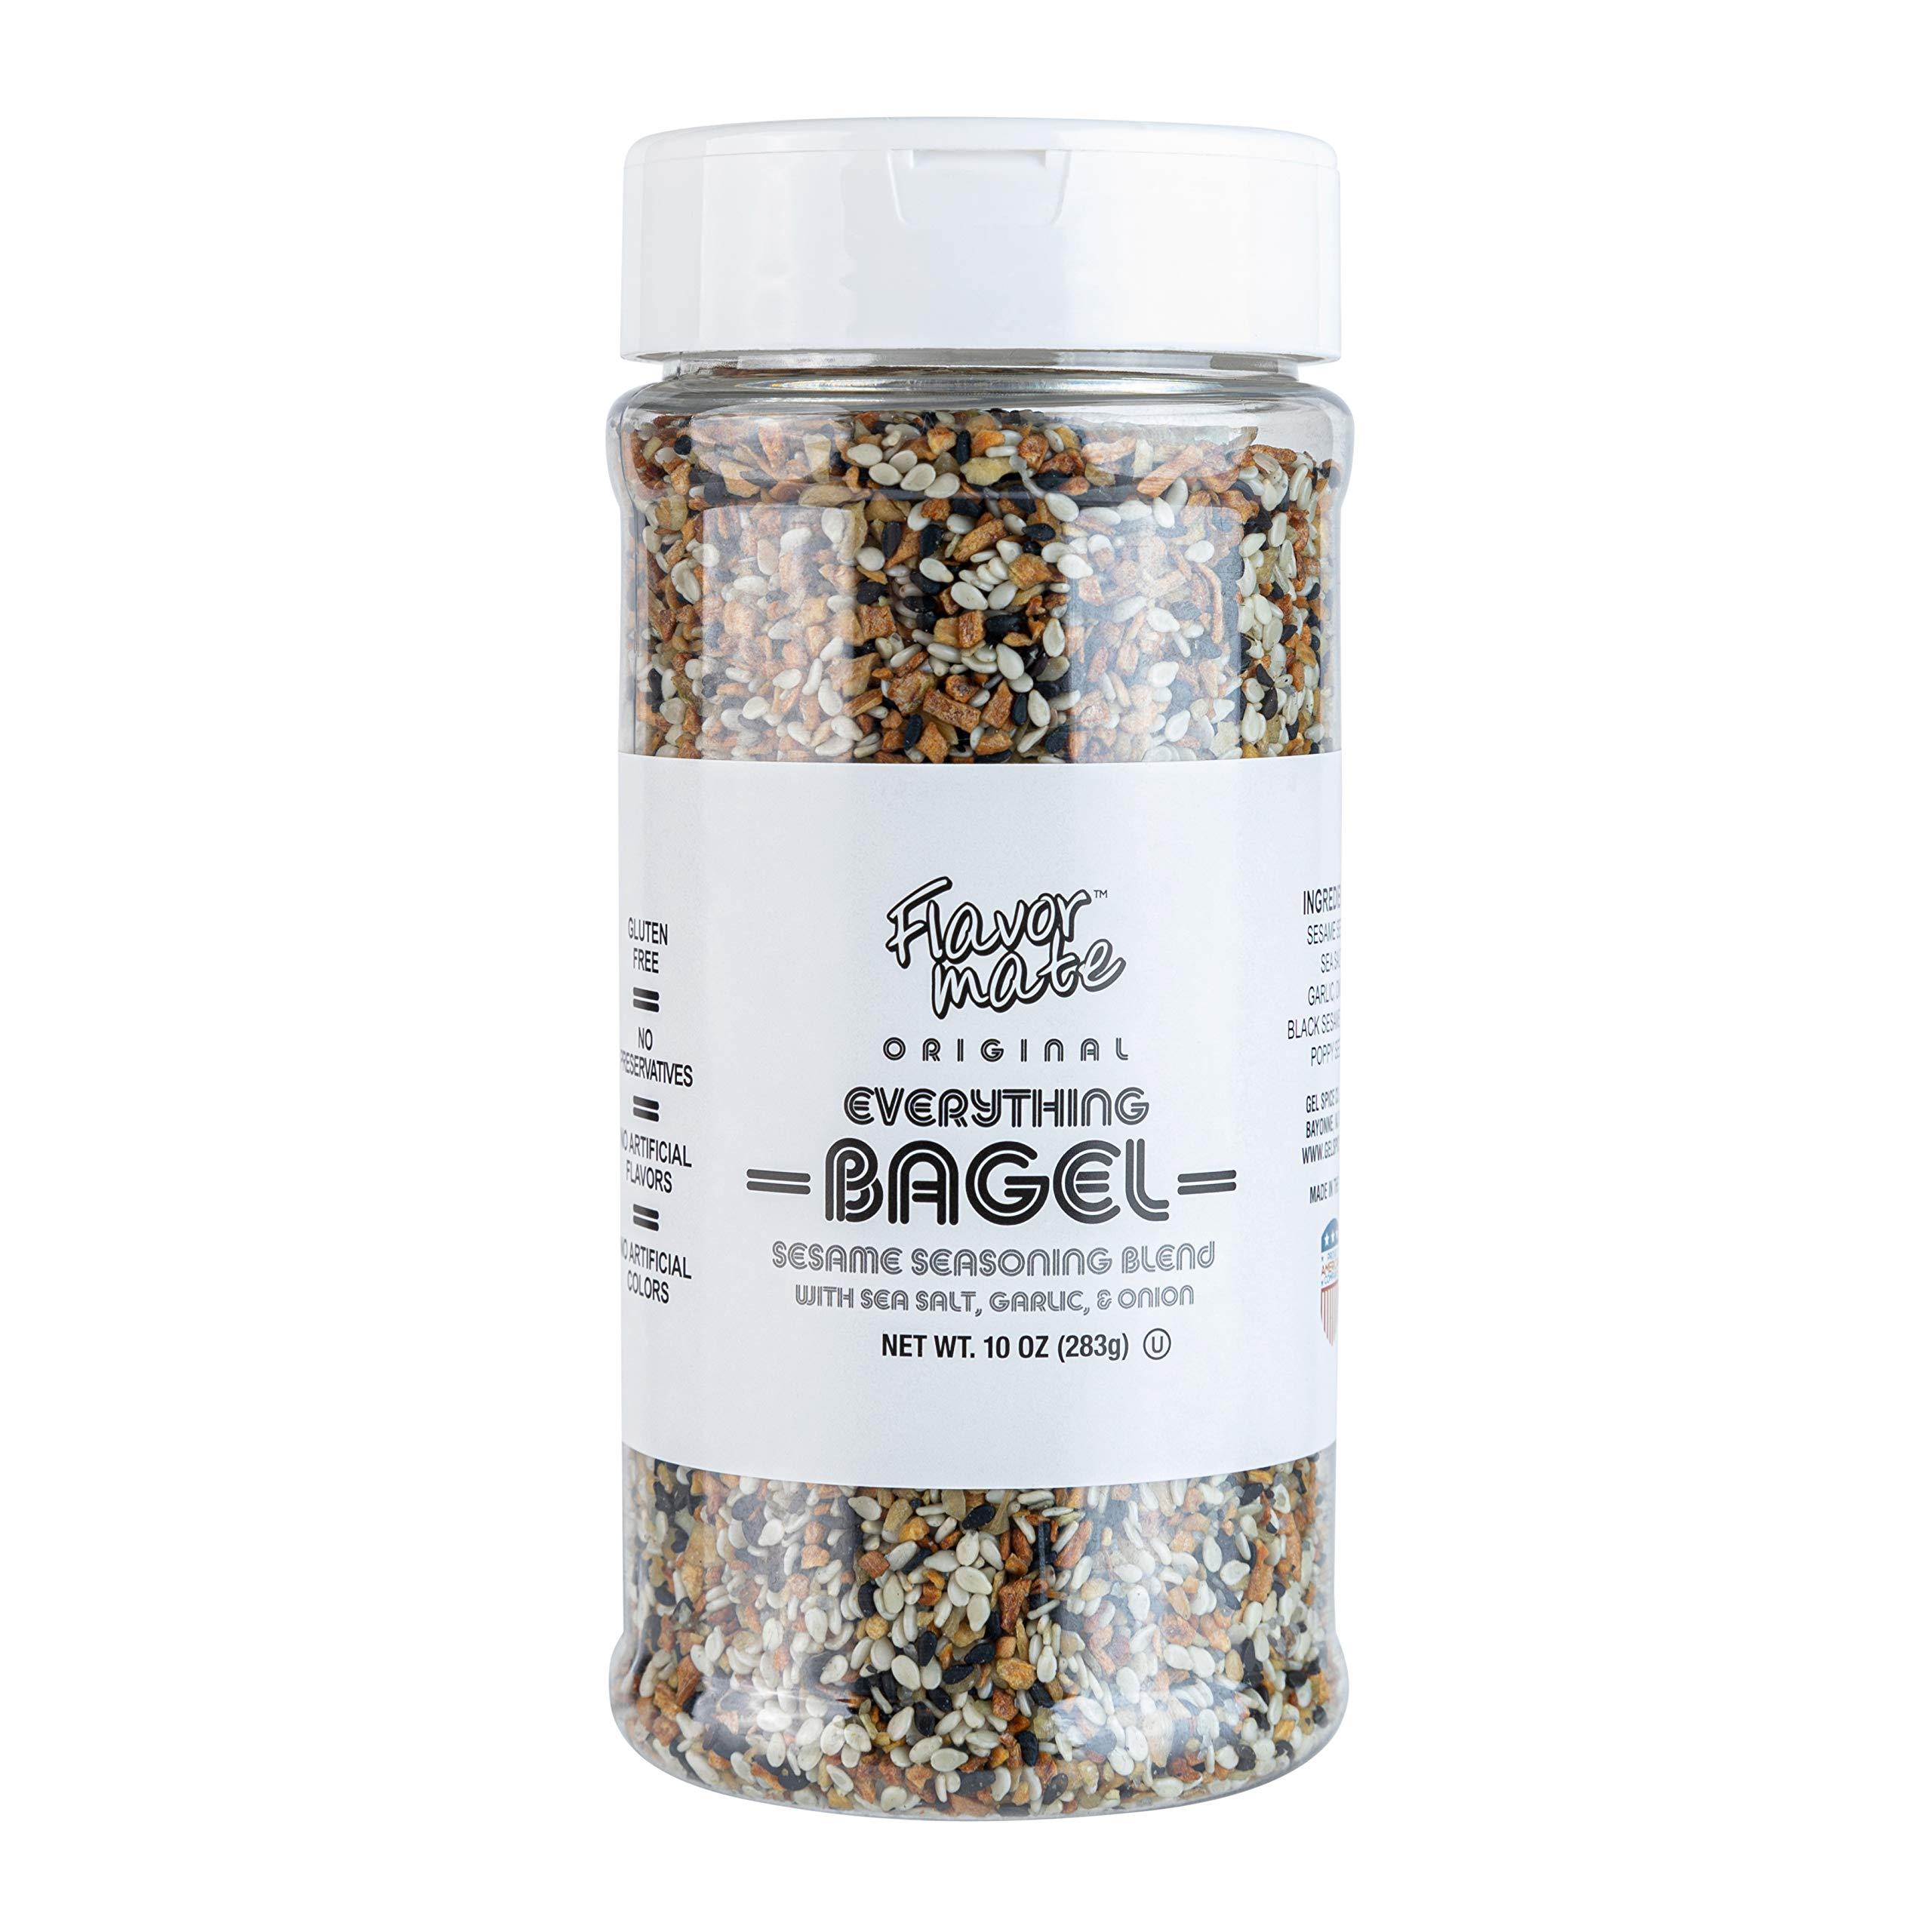 Flavor Mate Original Everything Bagel Seasoning 10 OZ XL Shaker Jar Blend Of Sesame Seeds Sea Salt Garlic Onion Black Sesame